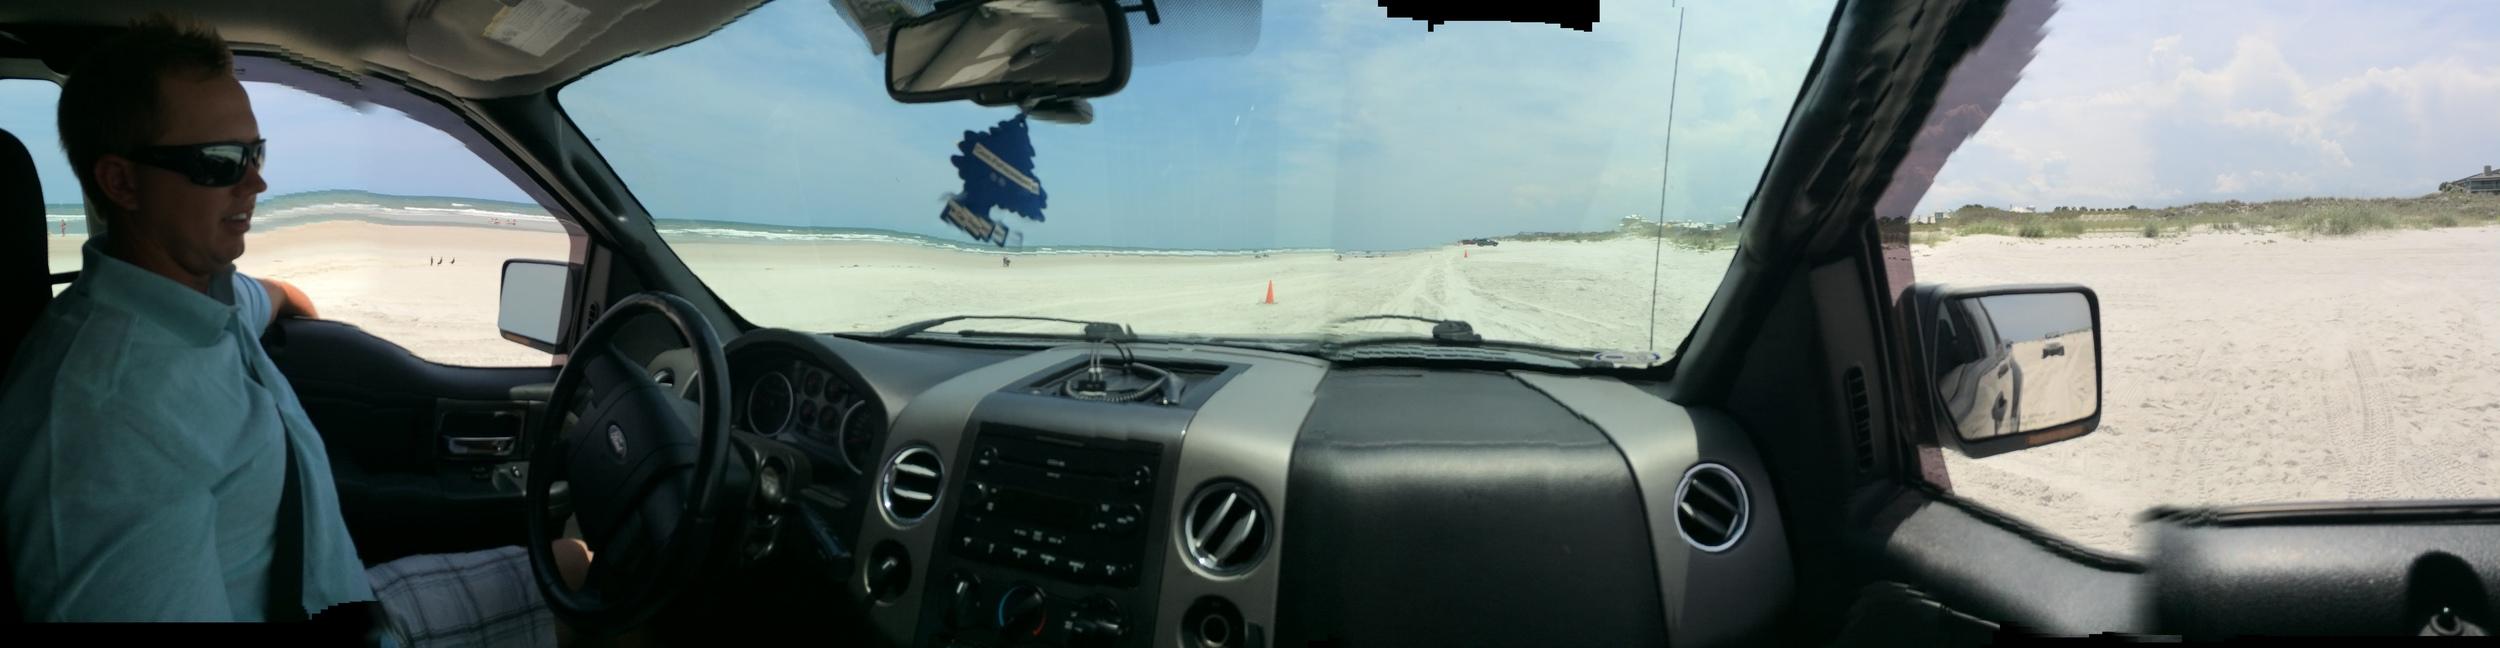 Driving on the beach! Feels like like driving on slushy snow!